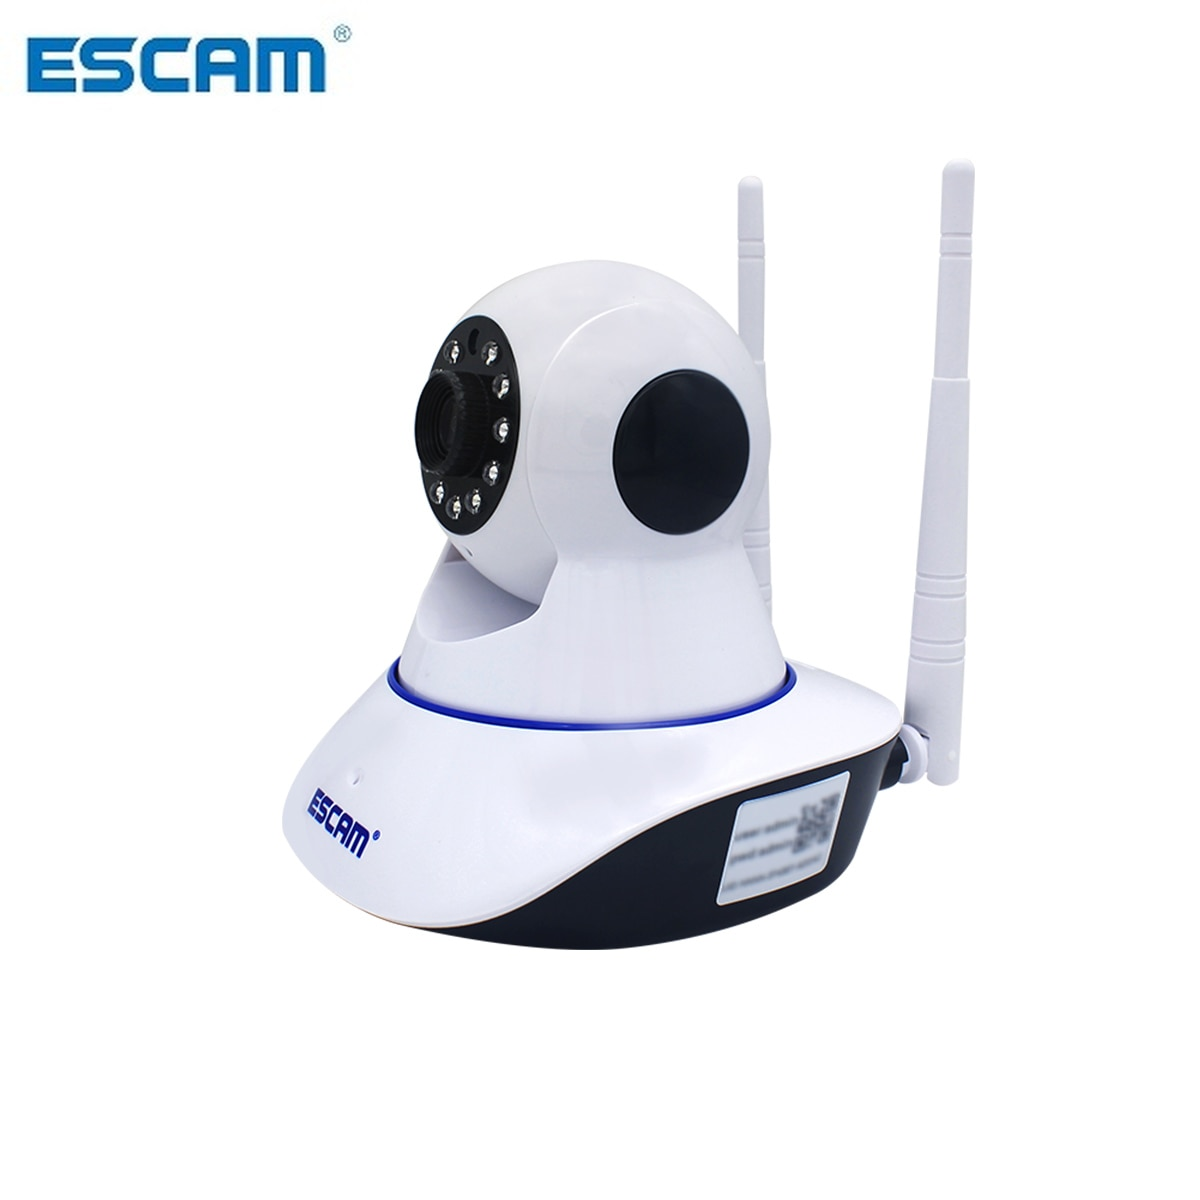 ESCAM-هوائي مزدوج G01 HD 1080P 200W ، مع وظيفة التحريك/الإمالة ، WiFi ، الأشعة تحت الحمراء ، كاميرا IP لاسلكية ، متوافقة مع ONVIF ، رؤية ليلية للتحدث ثنائية ال...